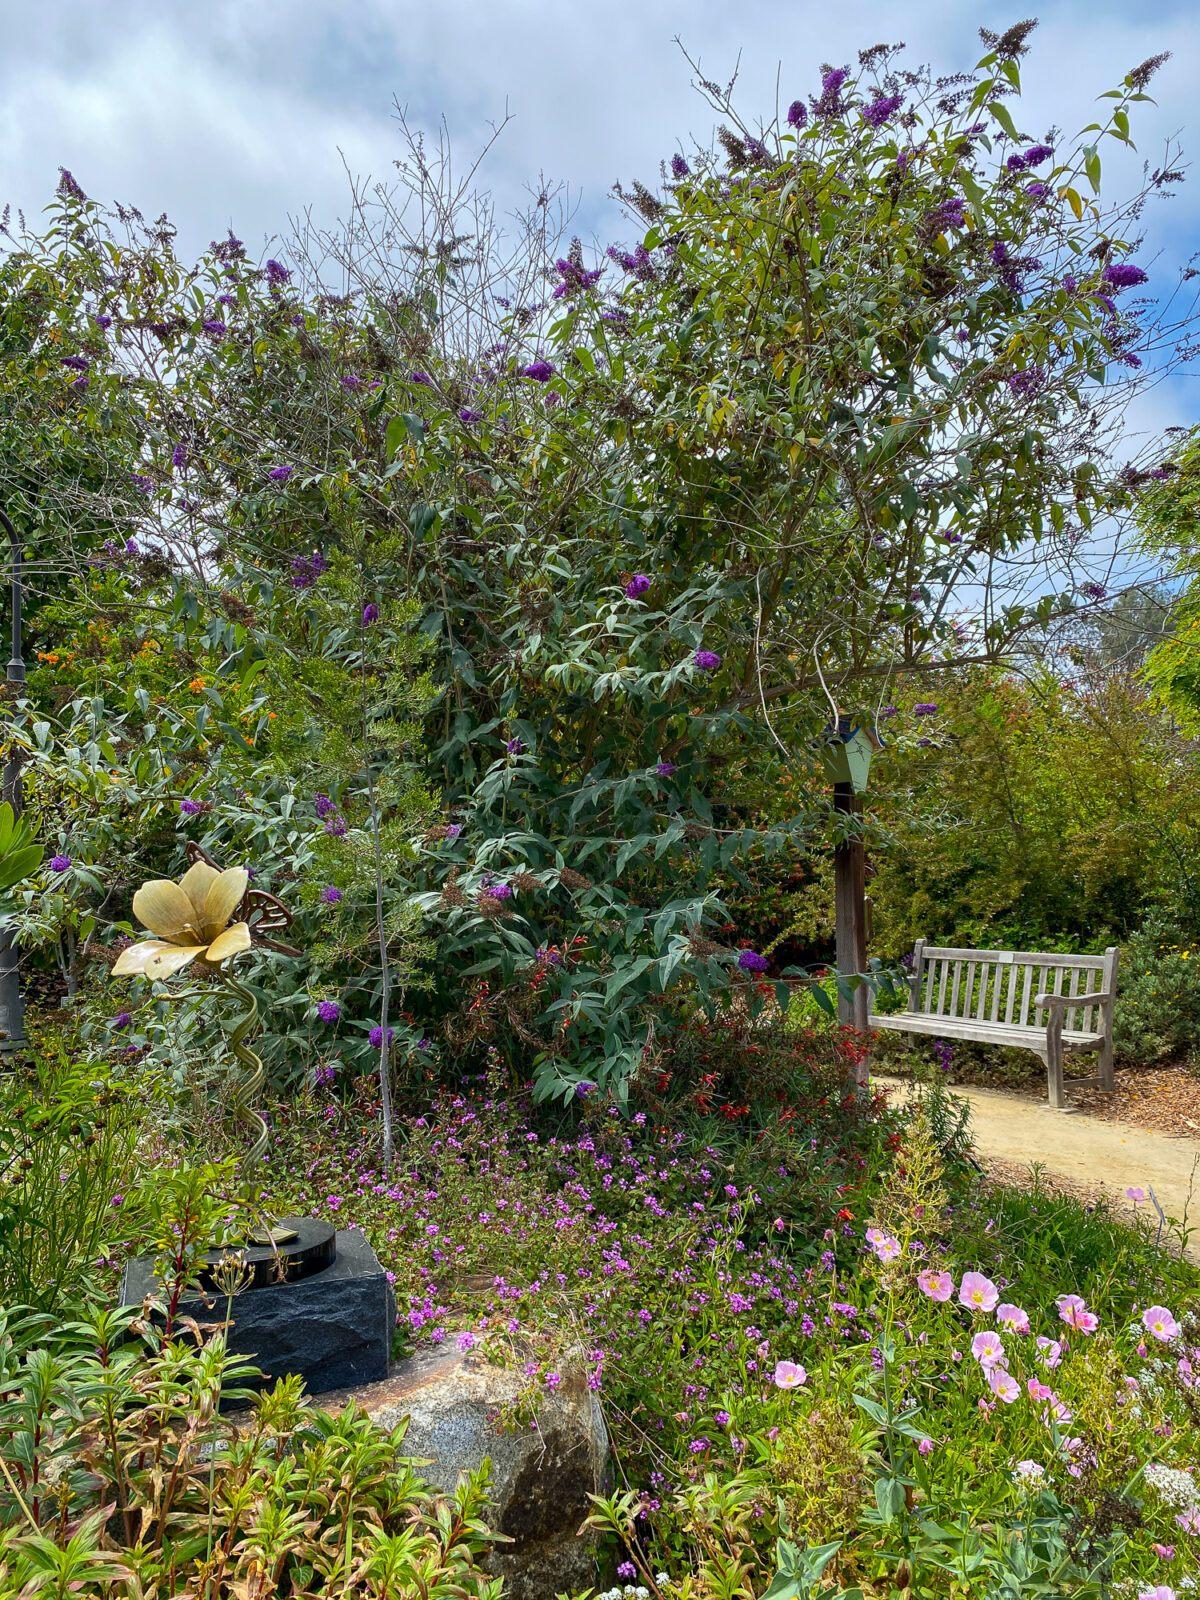 California Gardenscapes at San Diego Botanic Garden